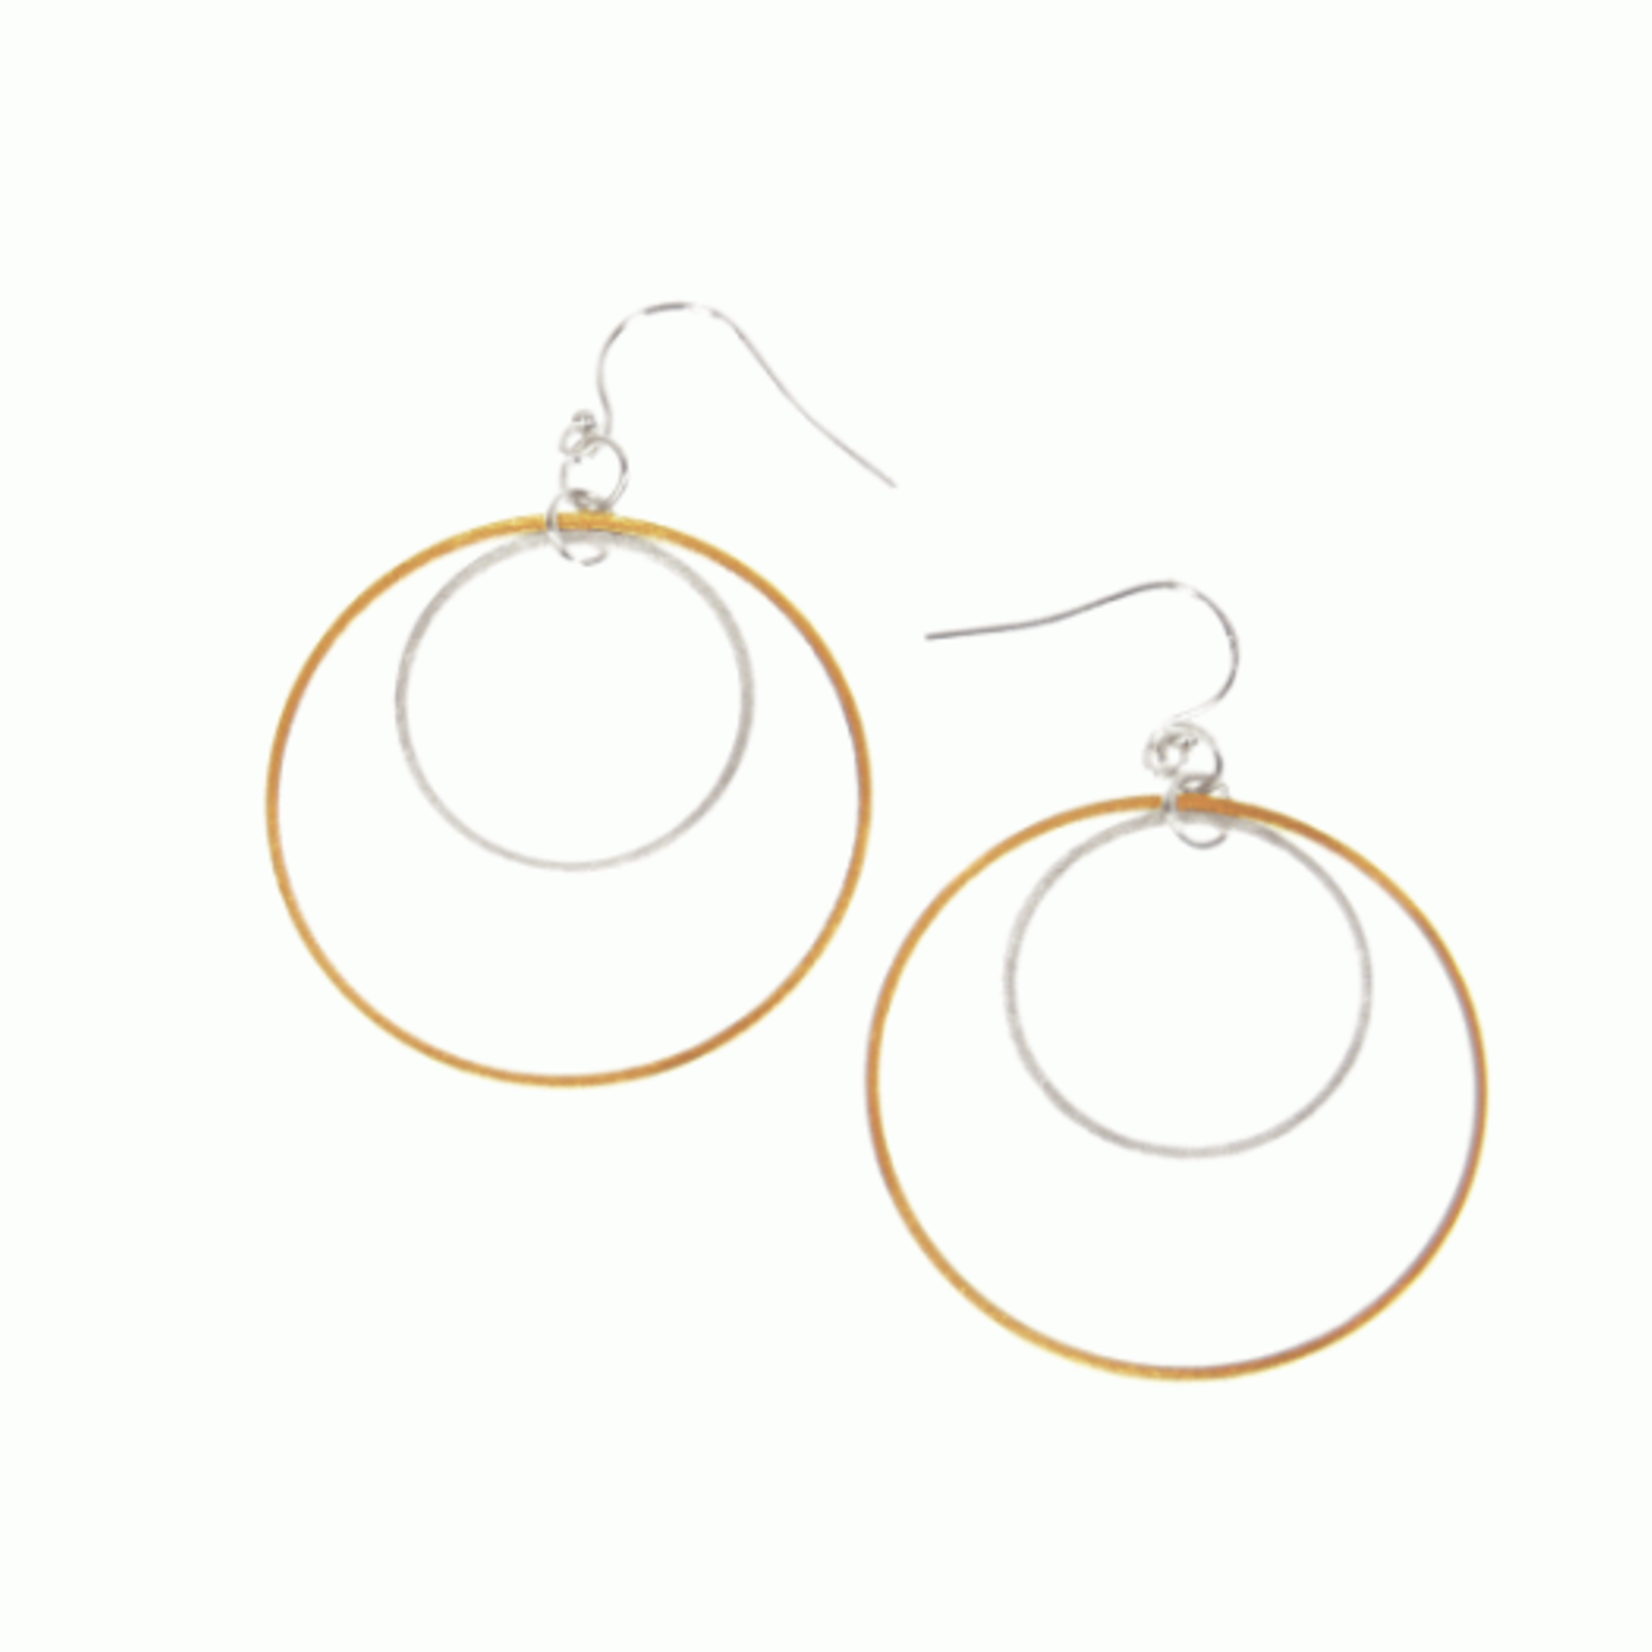 Joy Susan Joy Susan Scratched Gold Double Hoop Earring